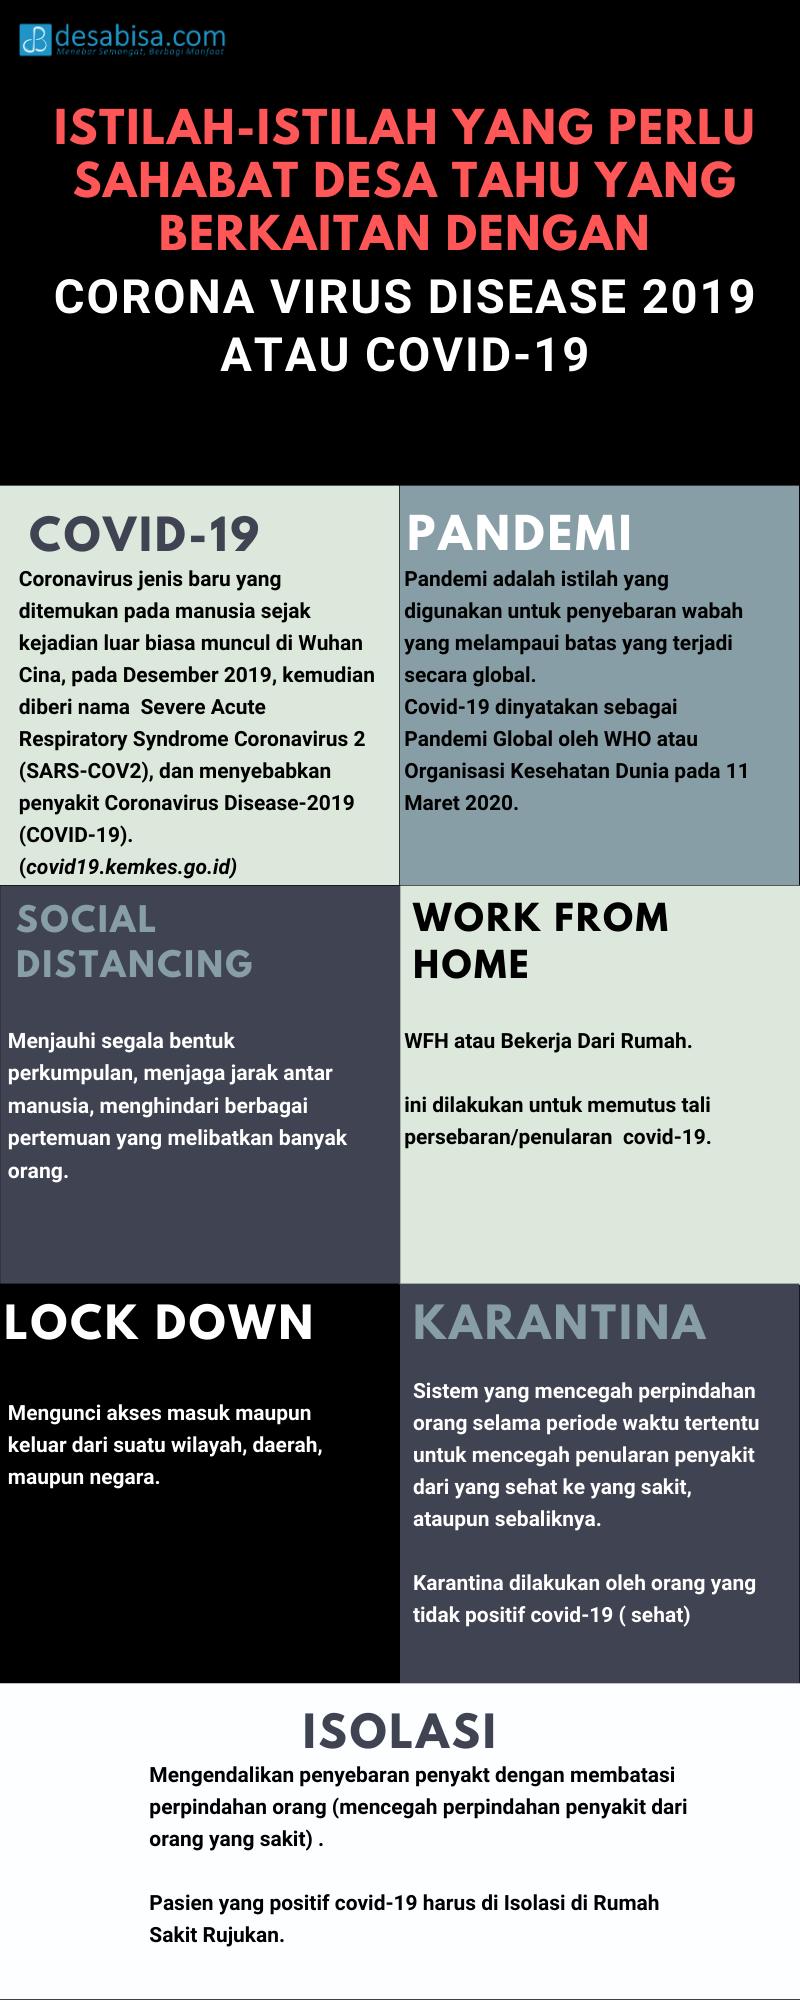 infografis corona virus